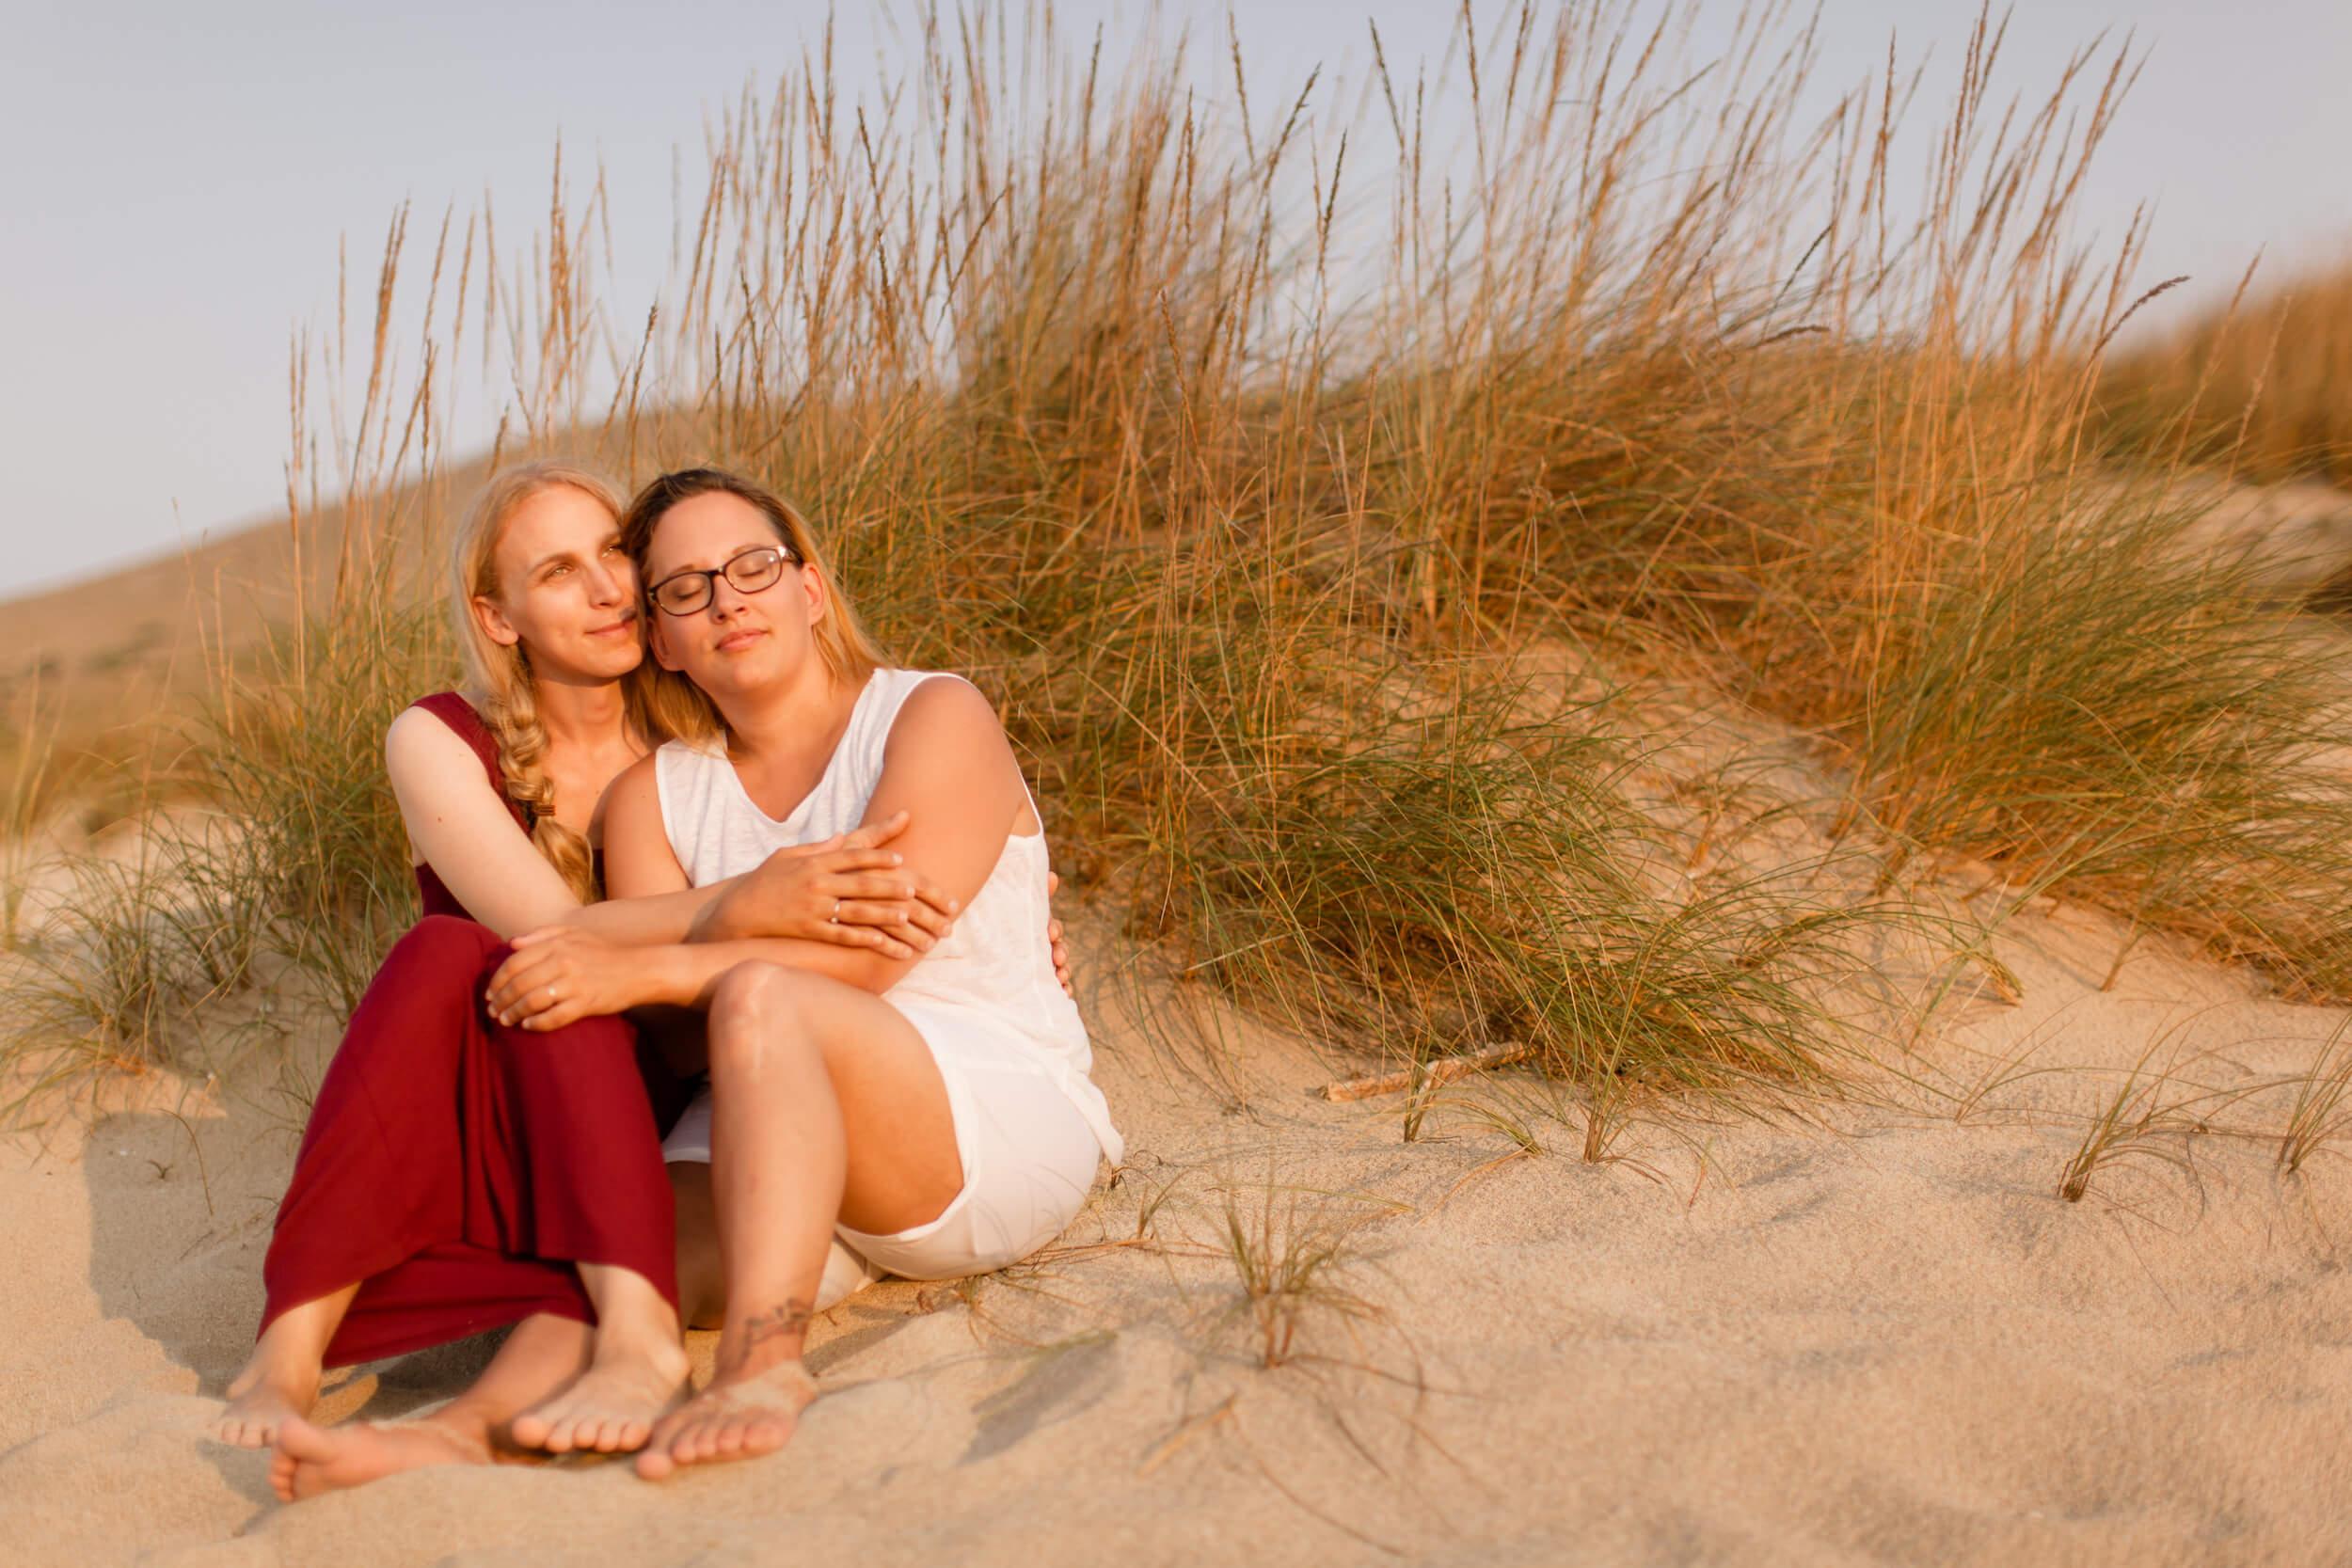 A female couple sits on the beach in Palma de Mallorca, Spain.